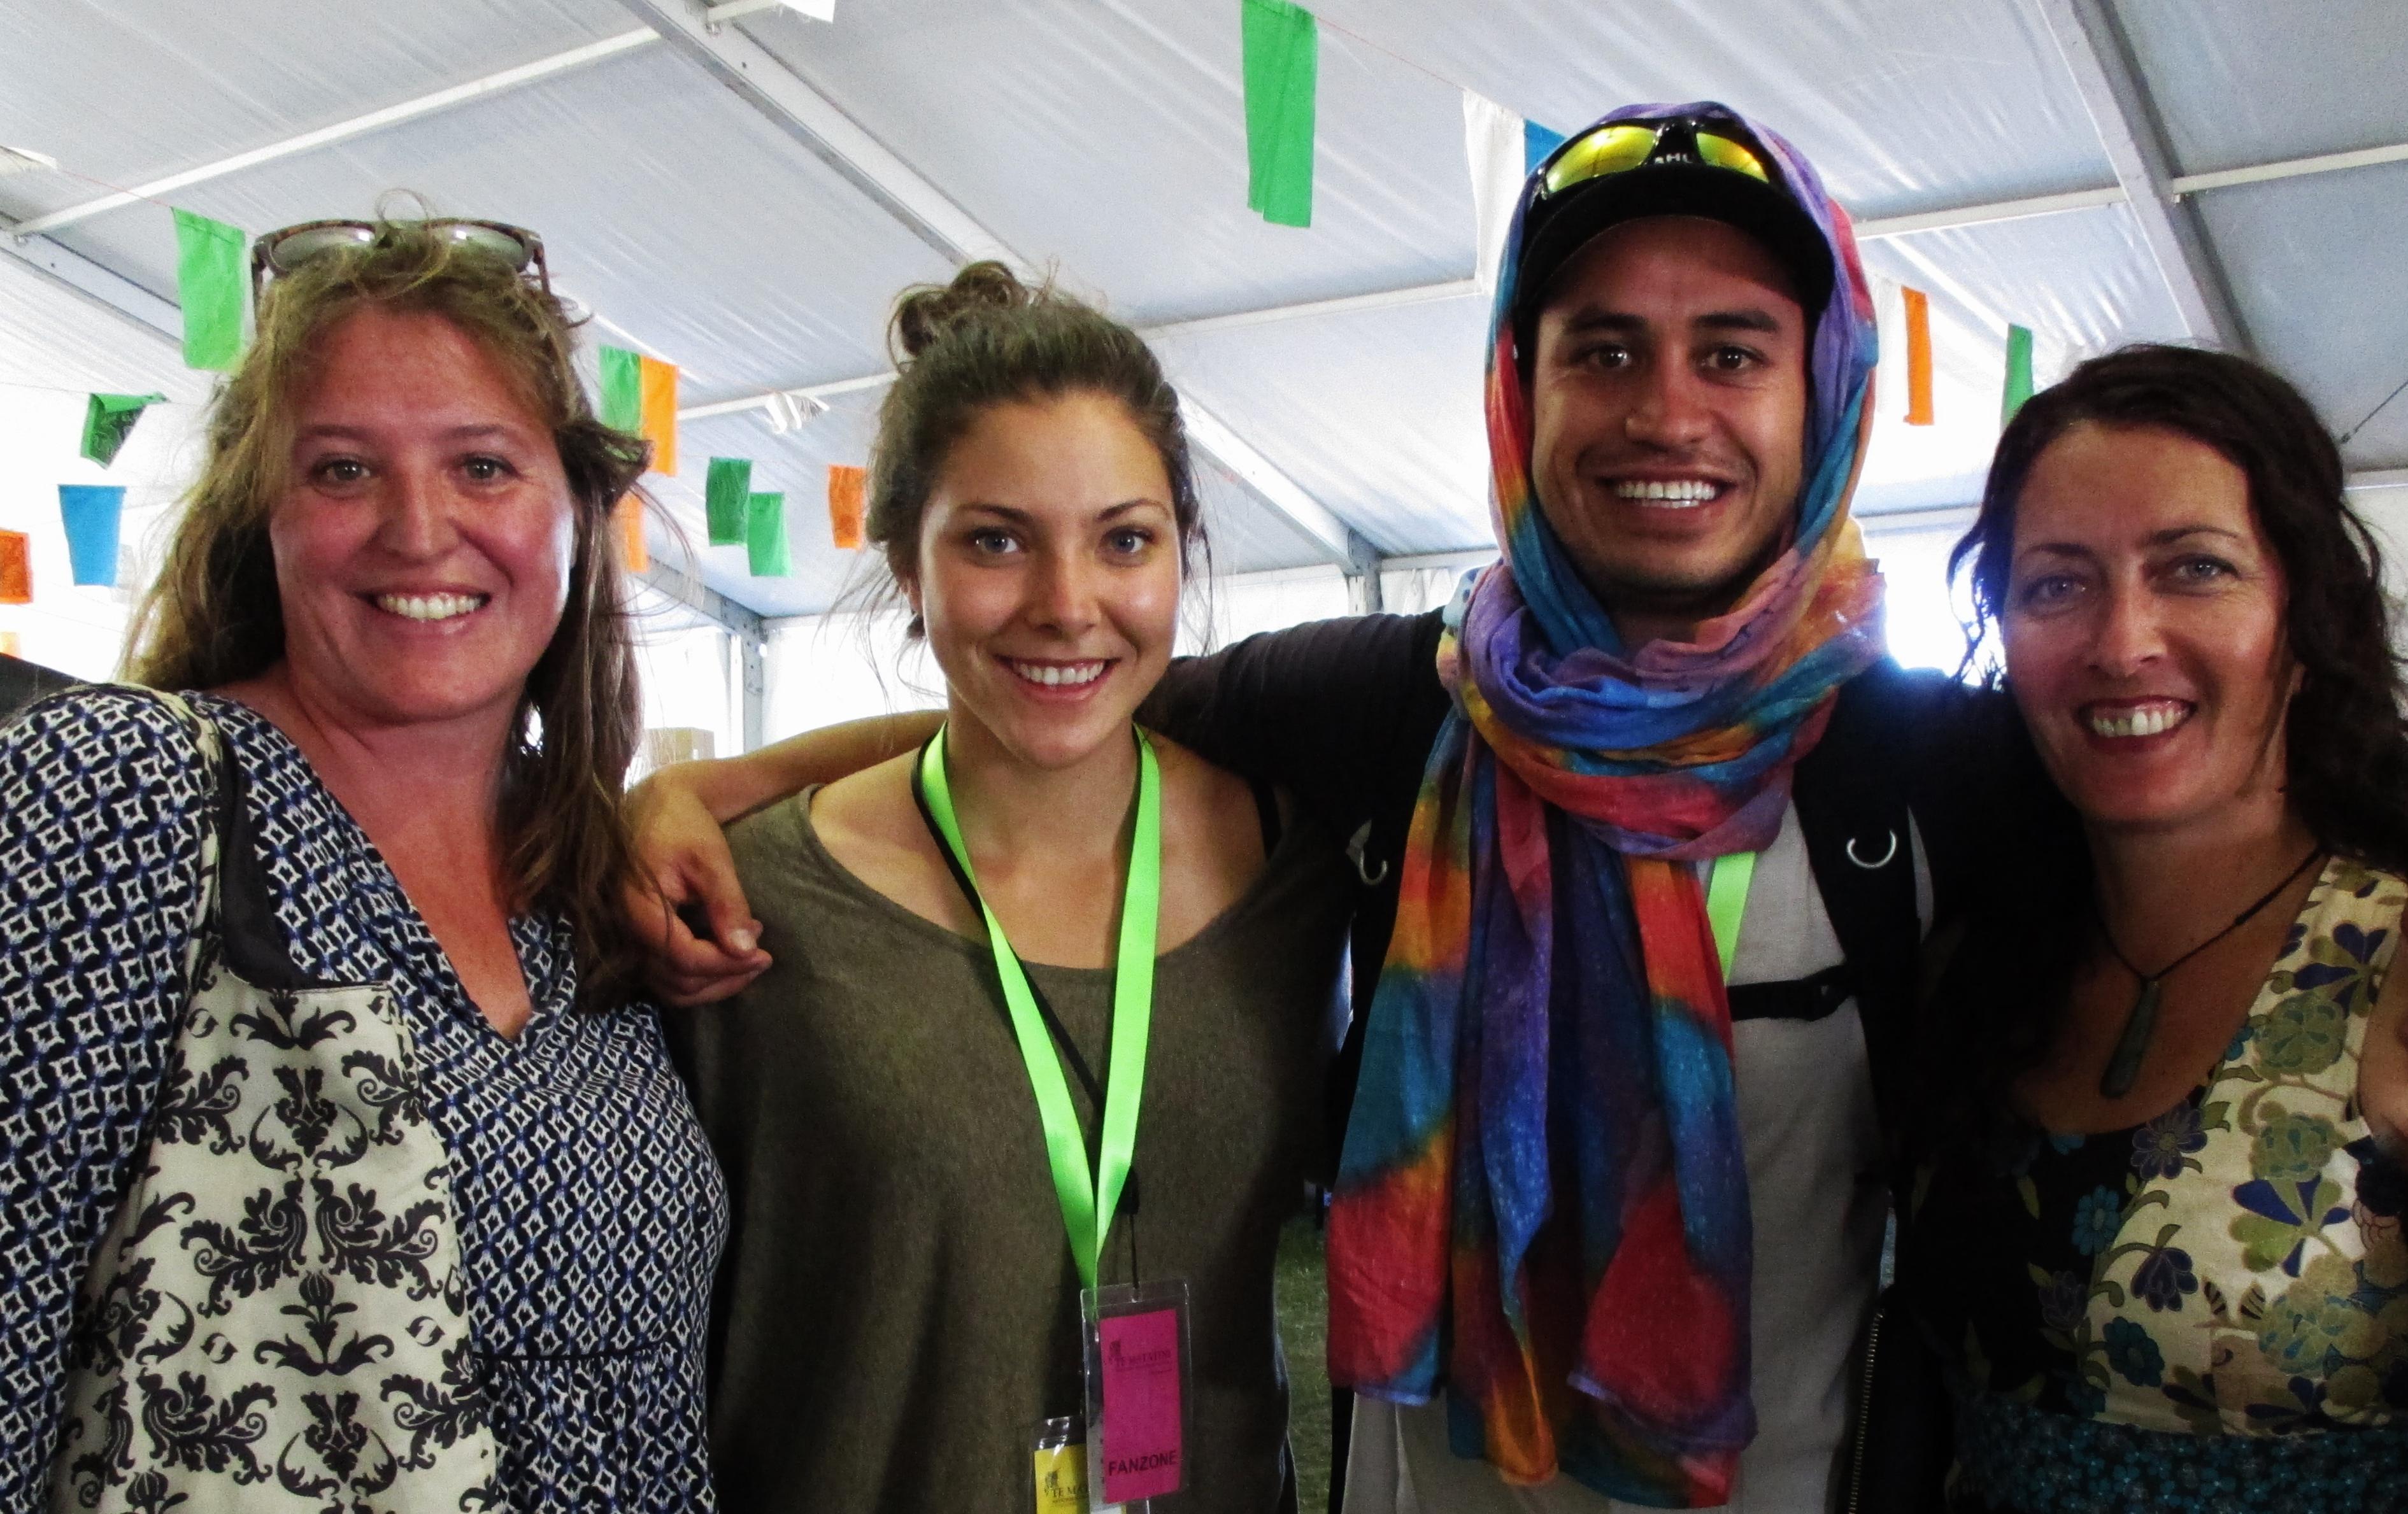 Checking out the awesome market stalls. From left, Ranui Ryan, Ngareka Bensemann, Waiariki Parata-Taiapa and Lisa Te Raki.